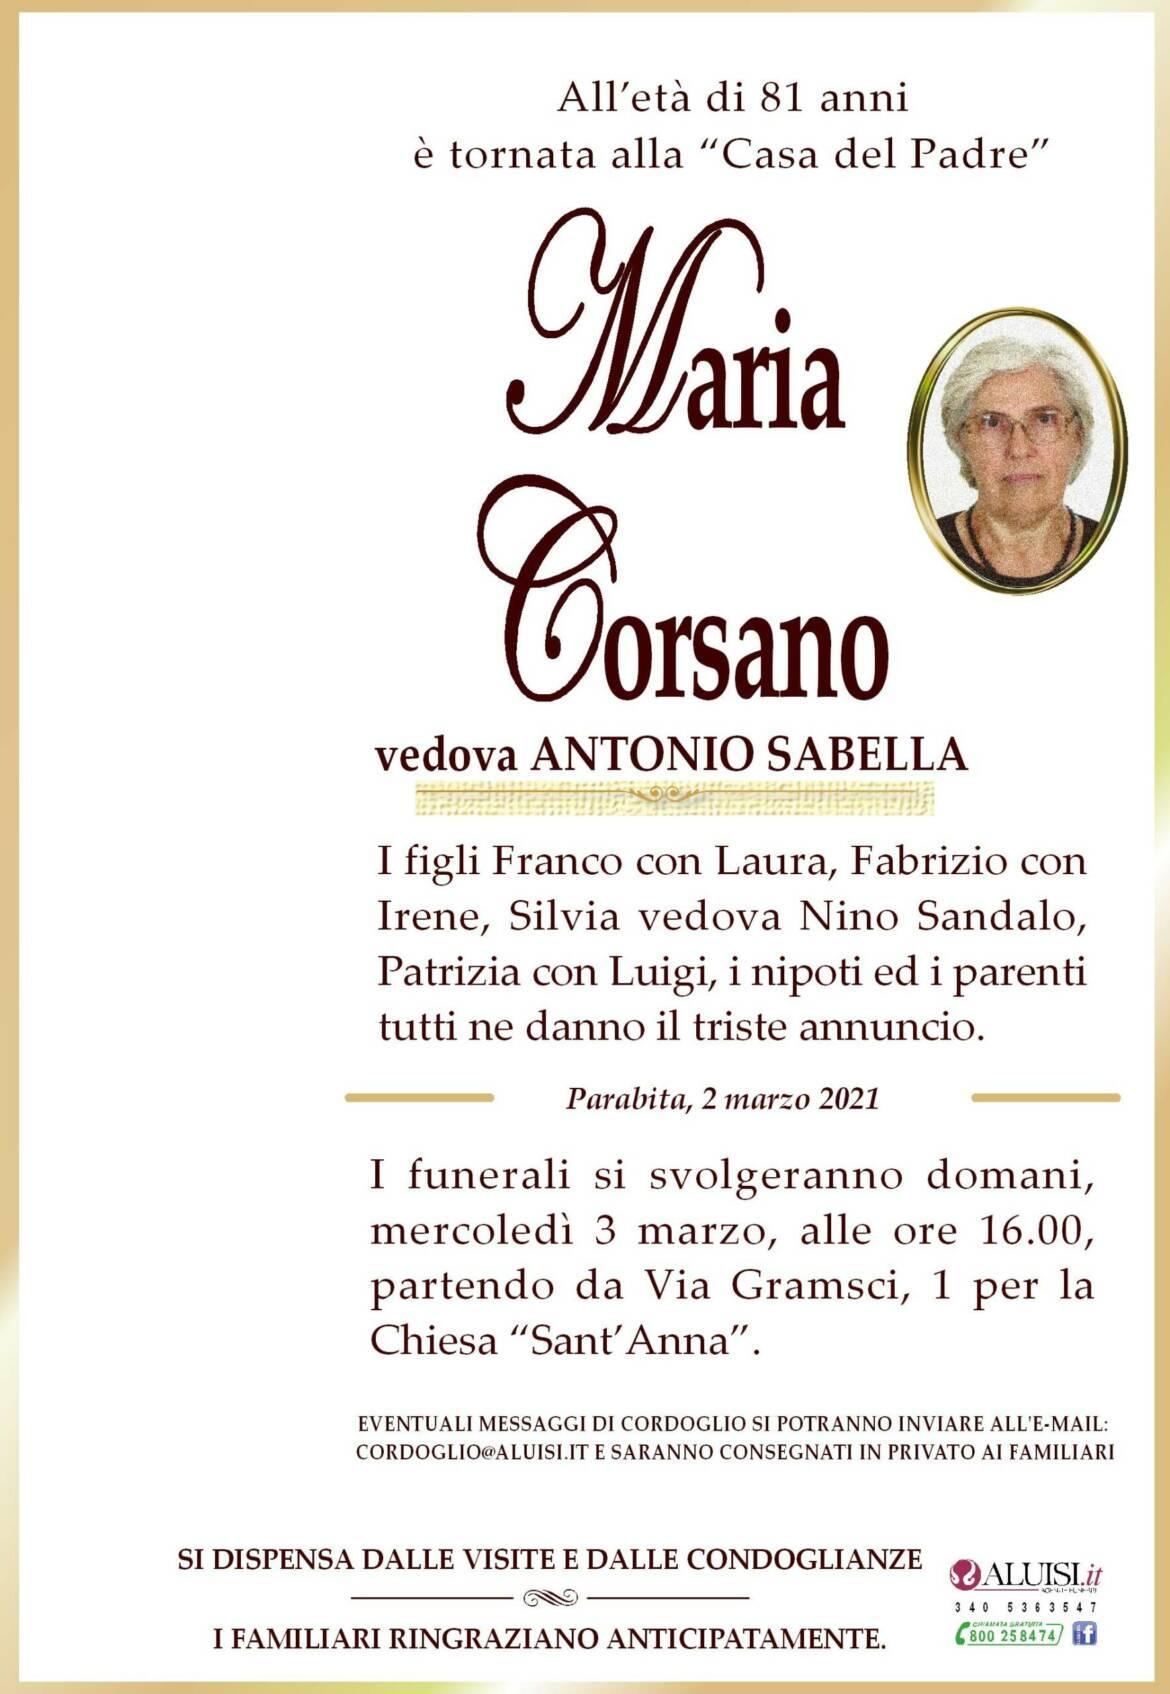 Annuncio-MARIA-CORSANO-PARABITA-scaled.jpg